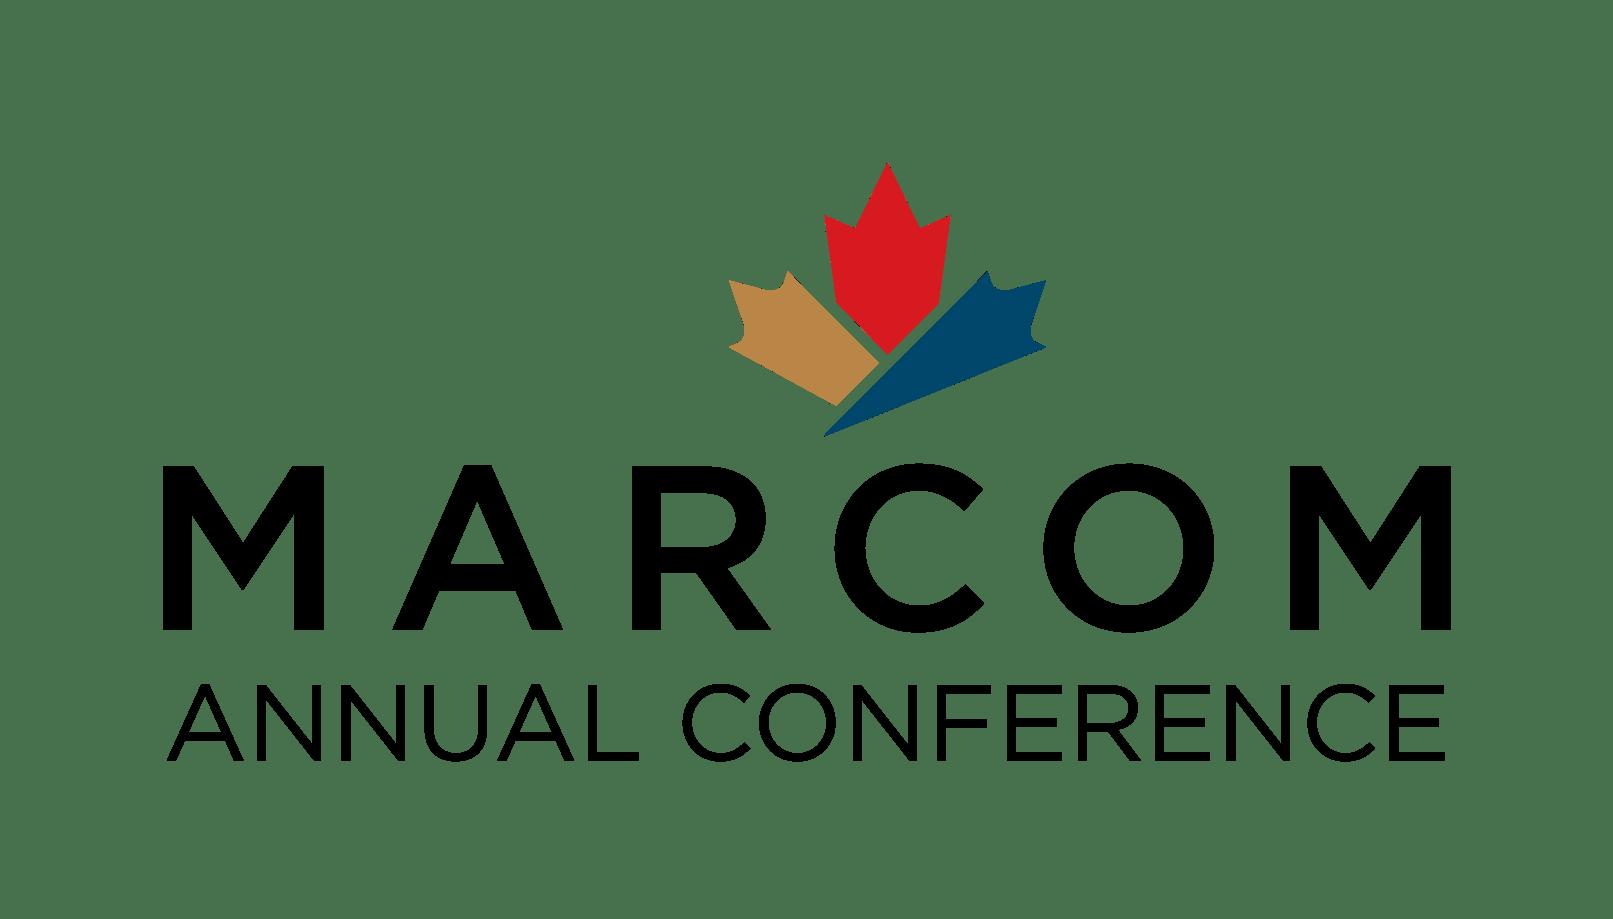 MARCOM Annual Conference